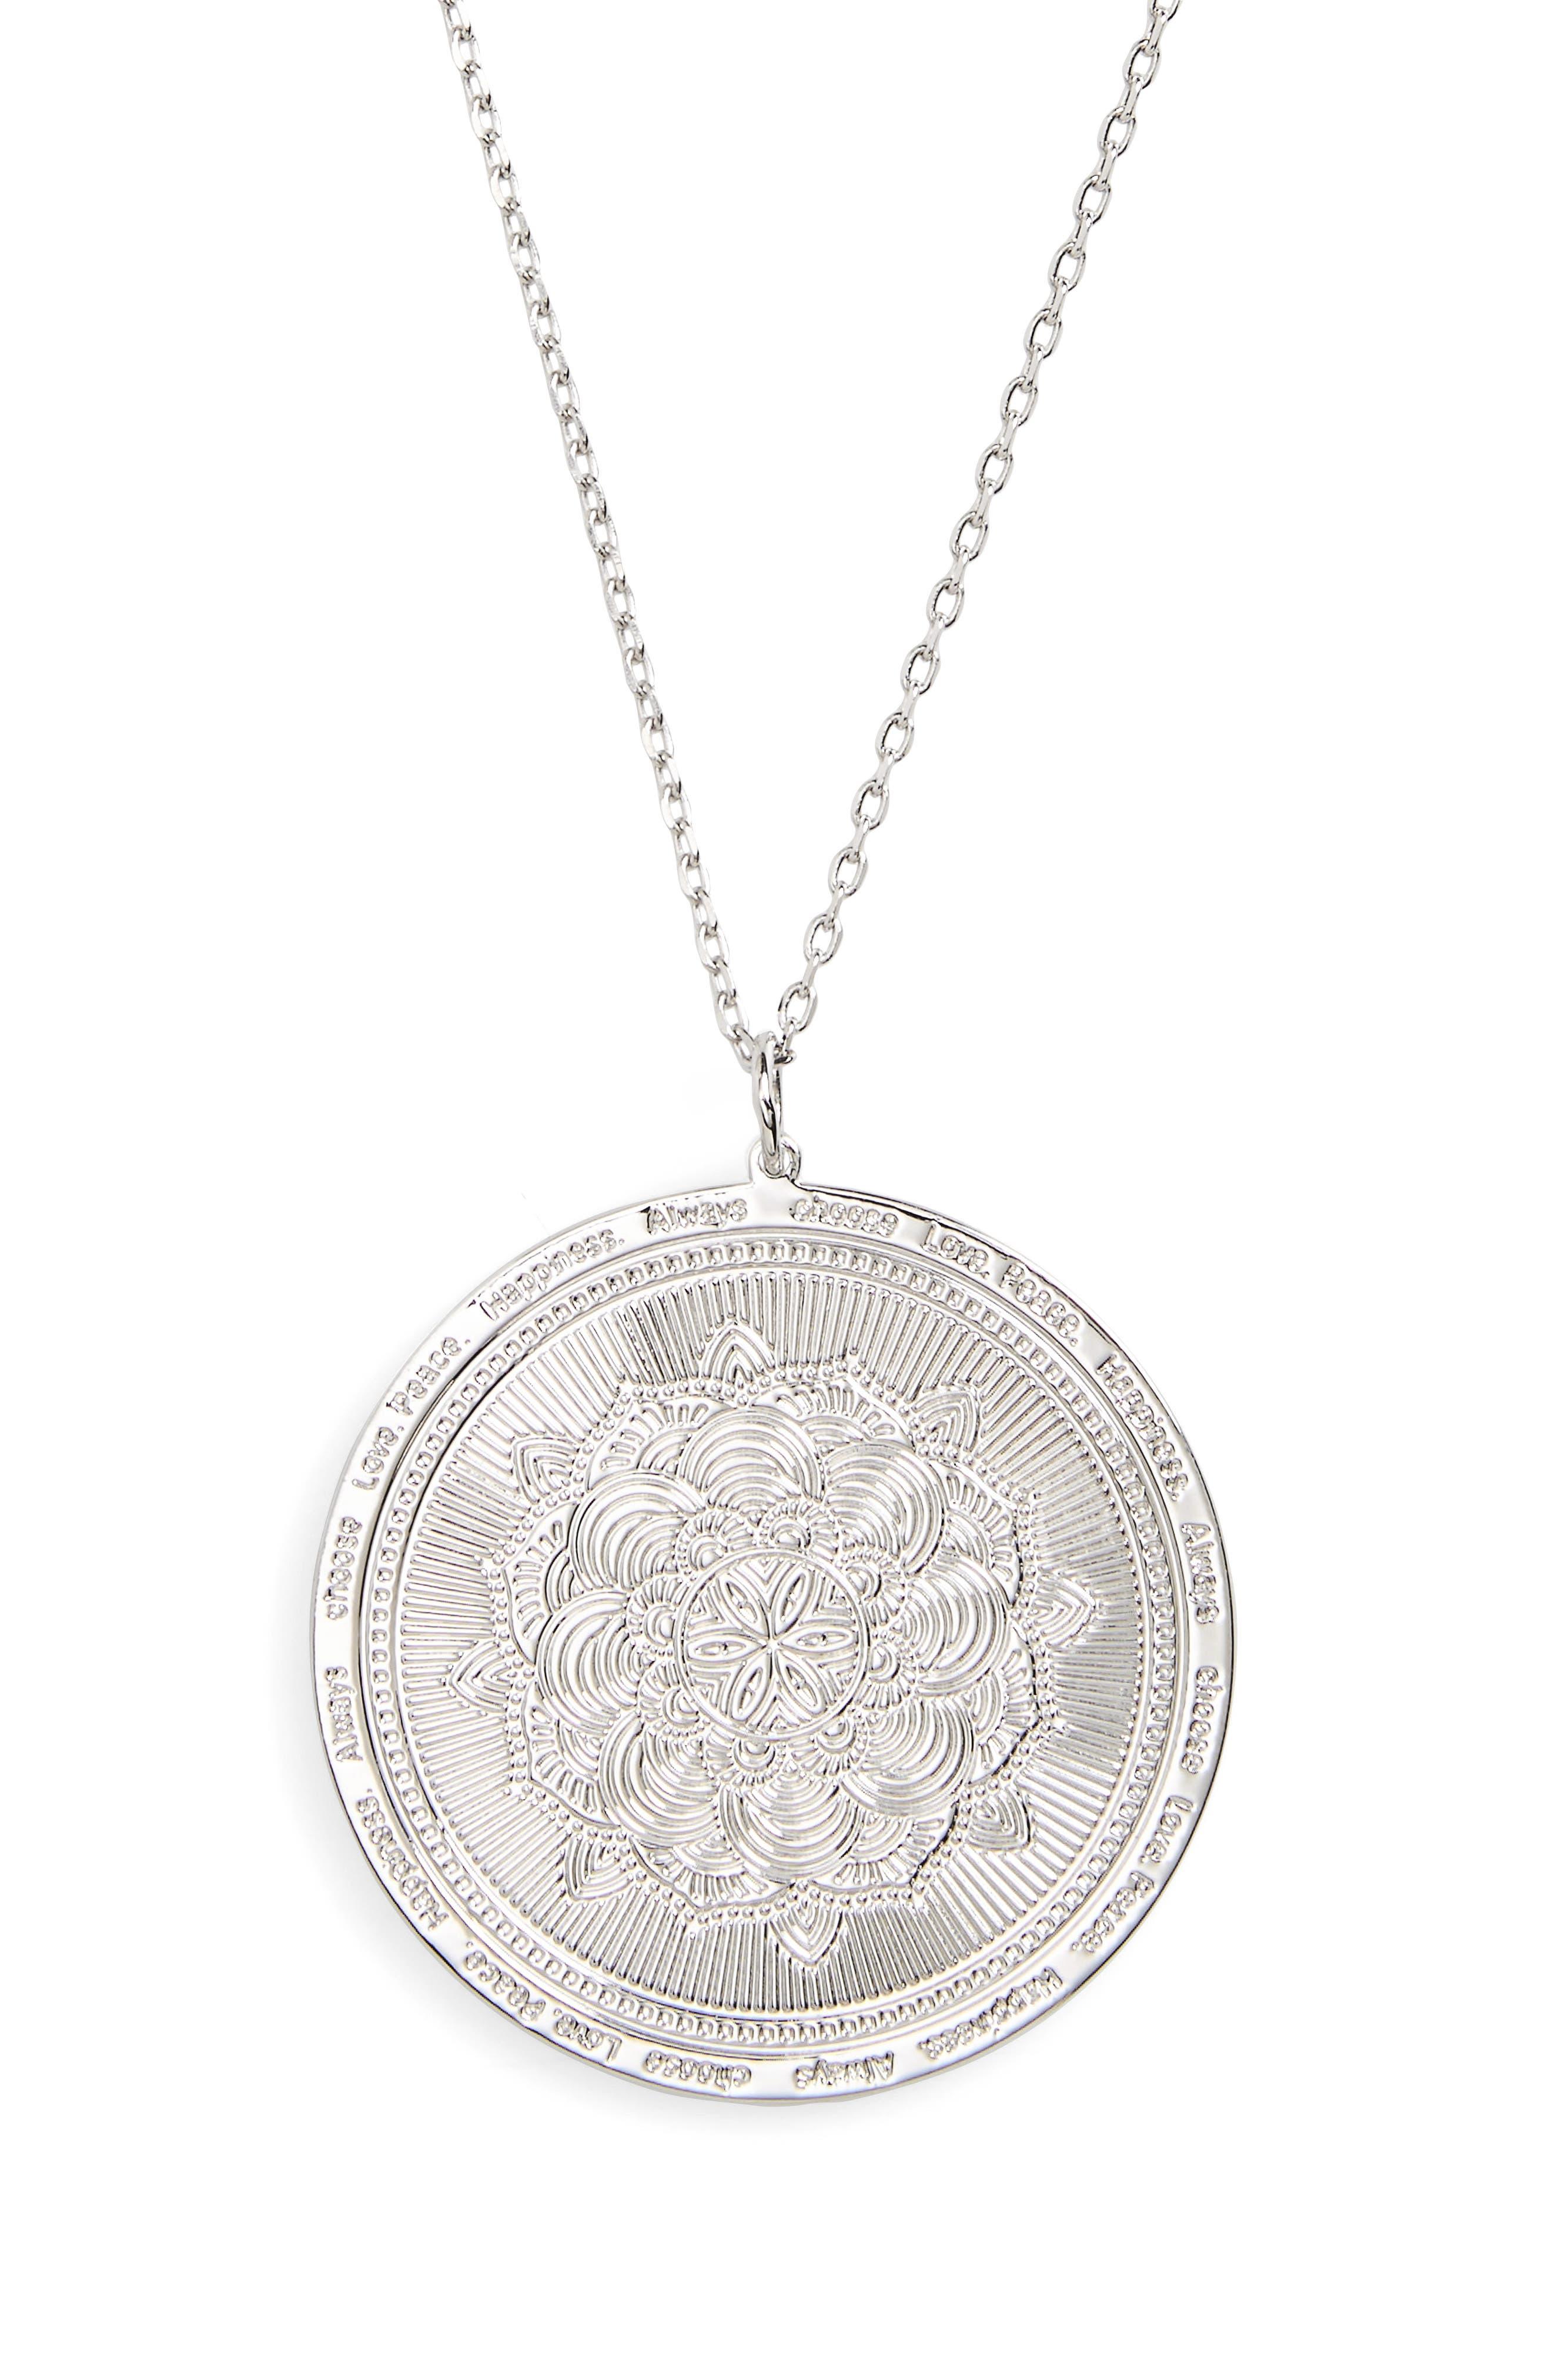 LULU DK Always Choose Love Pendant Necklace